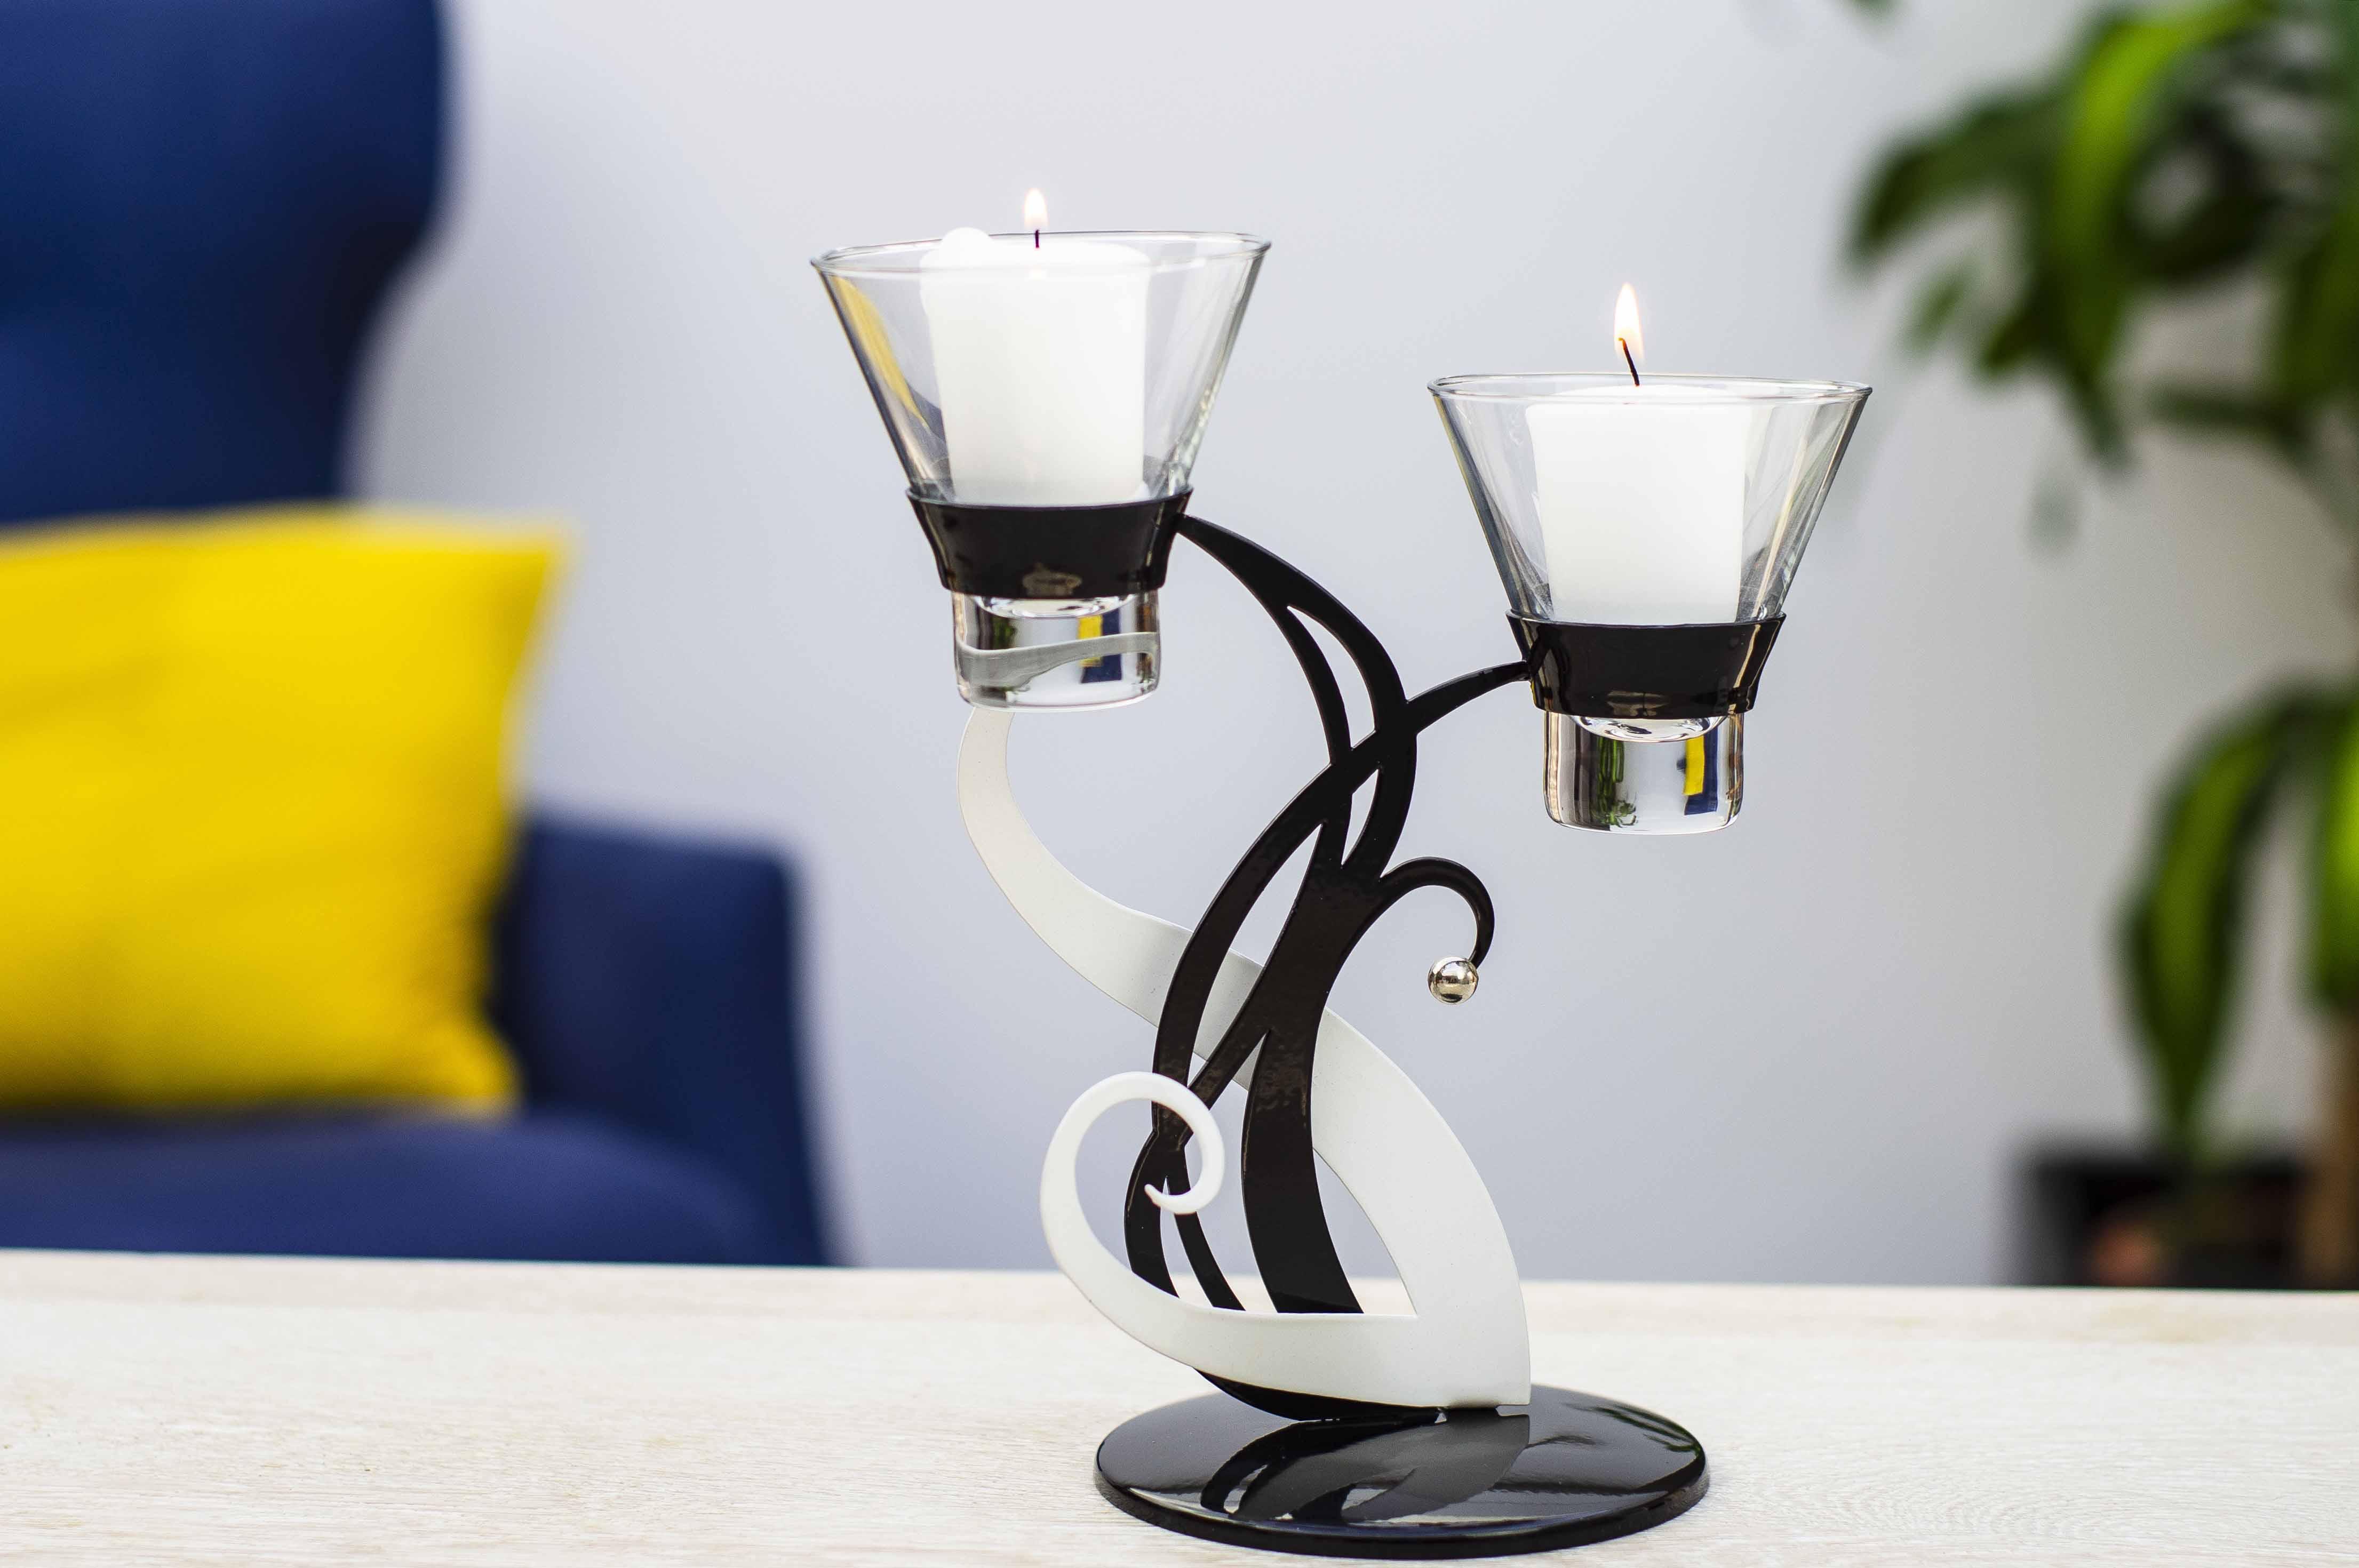 Candle Tea Light Holder Black & Silver Glass & Metal 10 holders (5 x single, 5 x double)